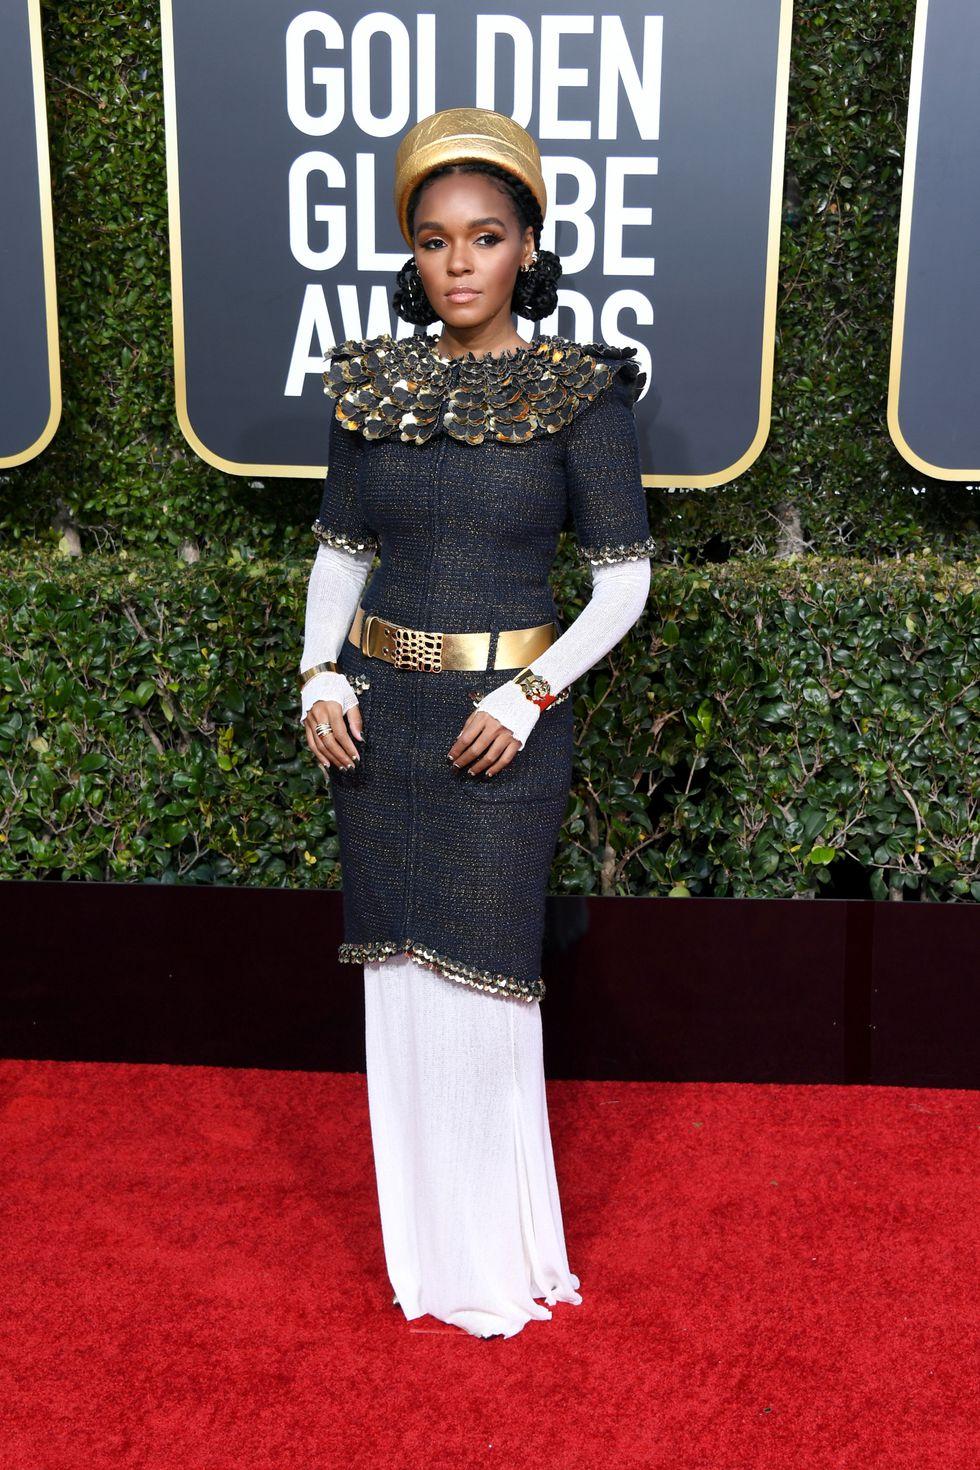 Janelle Monae Golden Globes 2019 dress